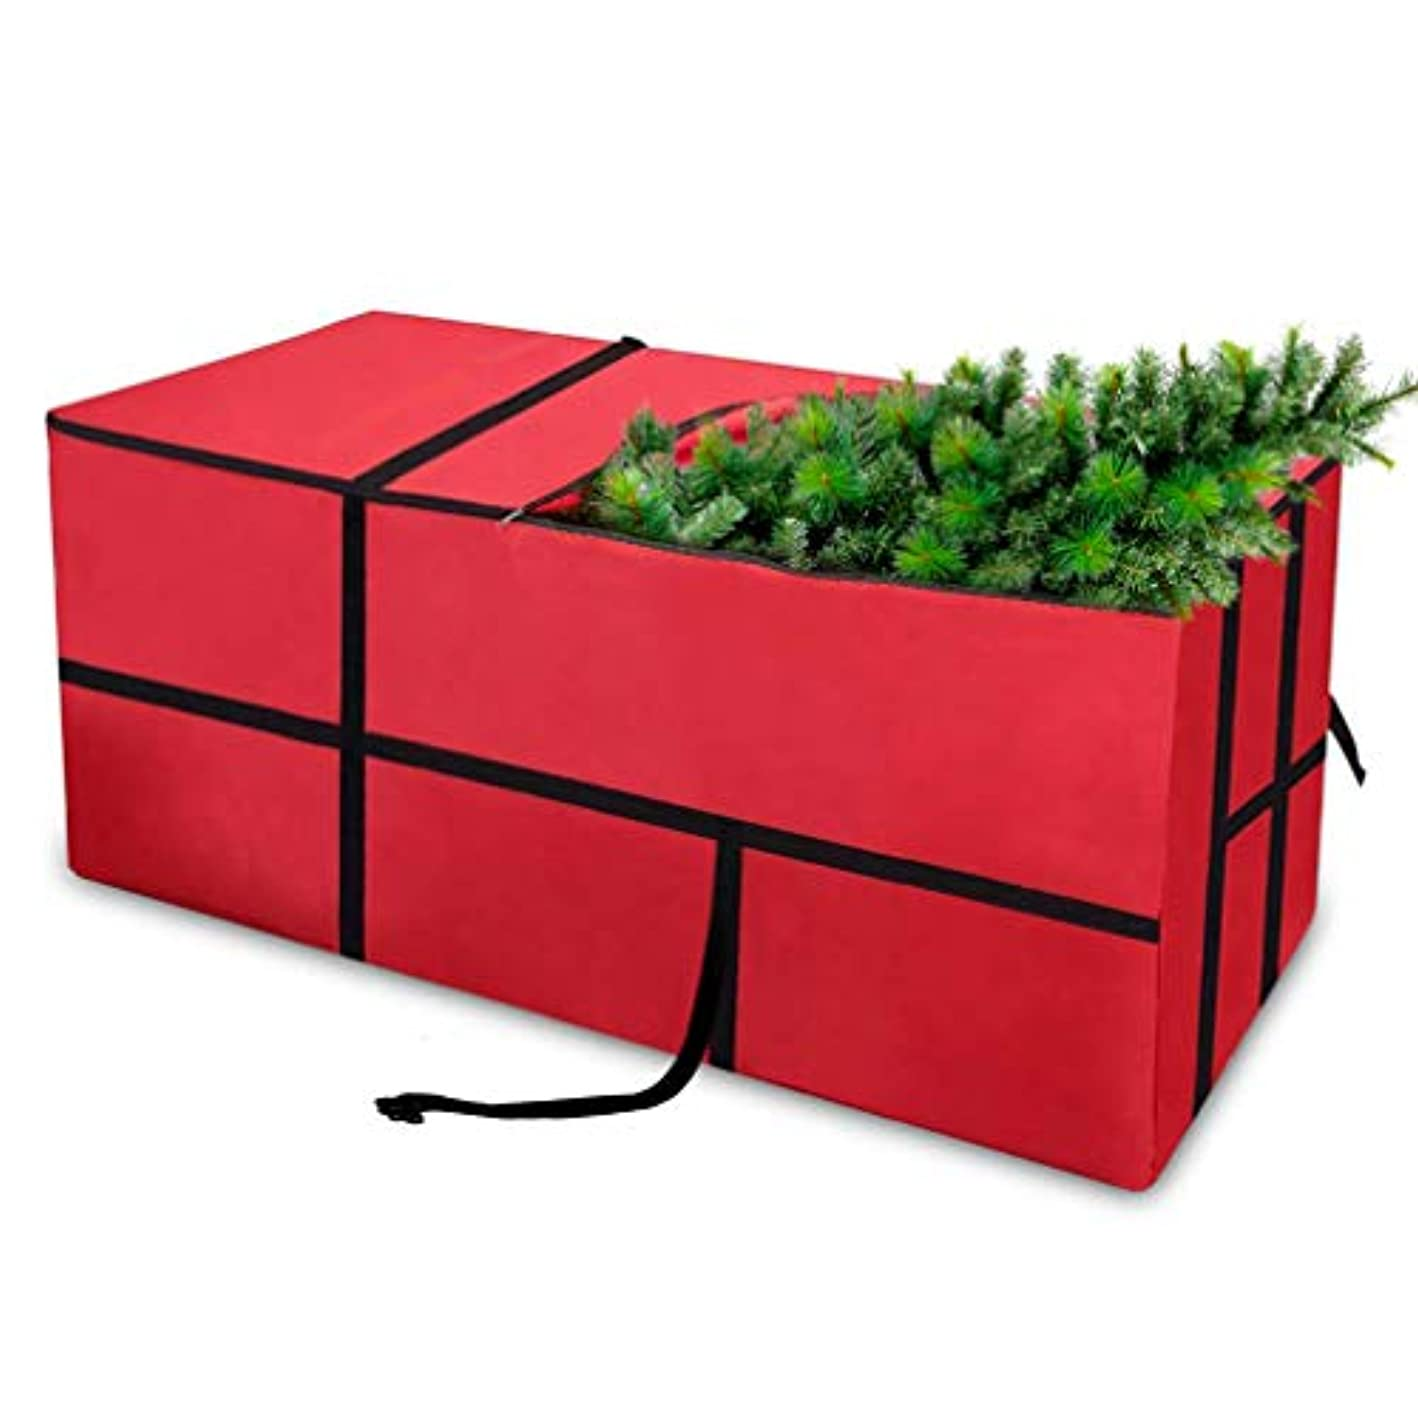 ProPik Holiday Tree Storage Bag, Heavy Duty Storage Container, 25